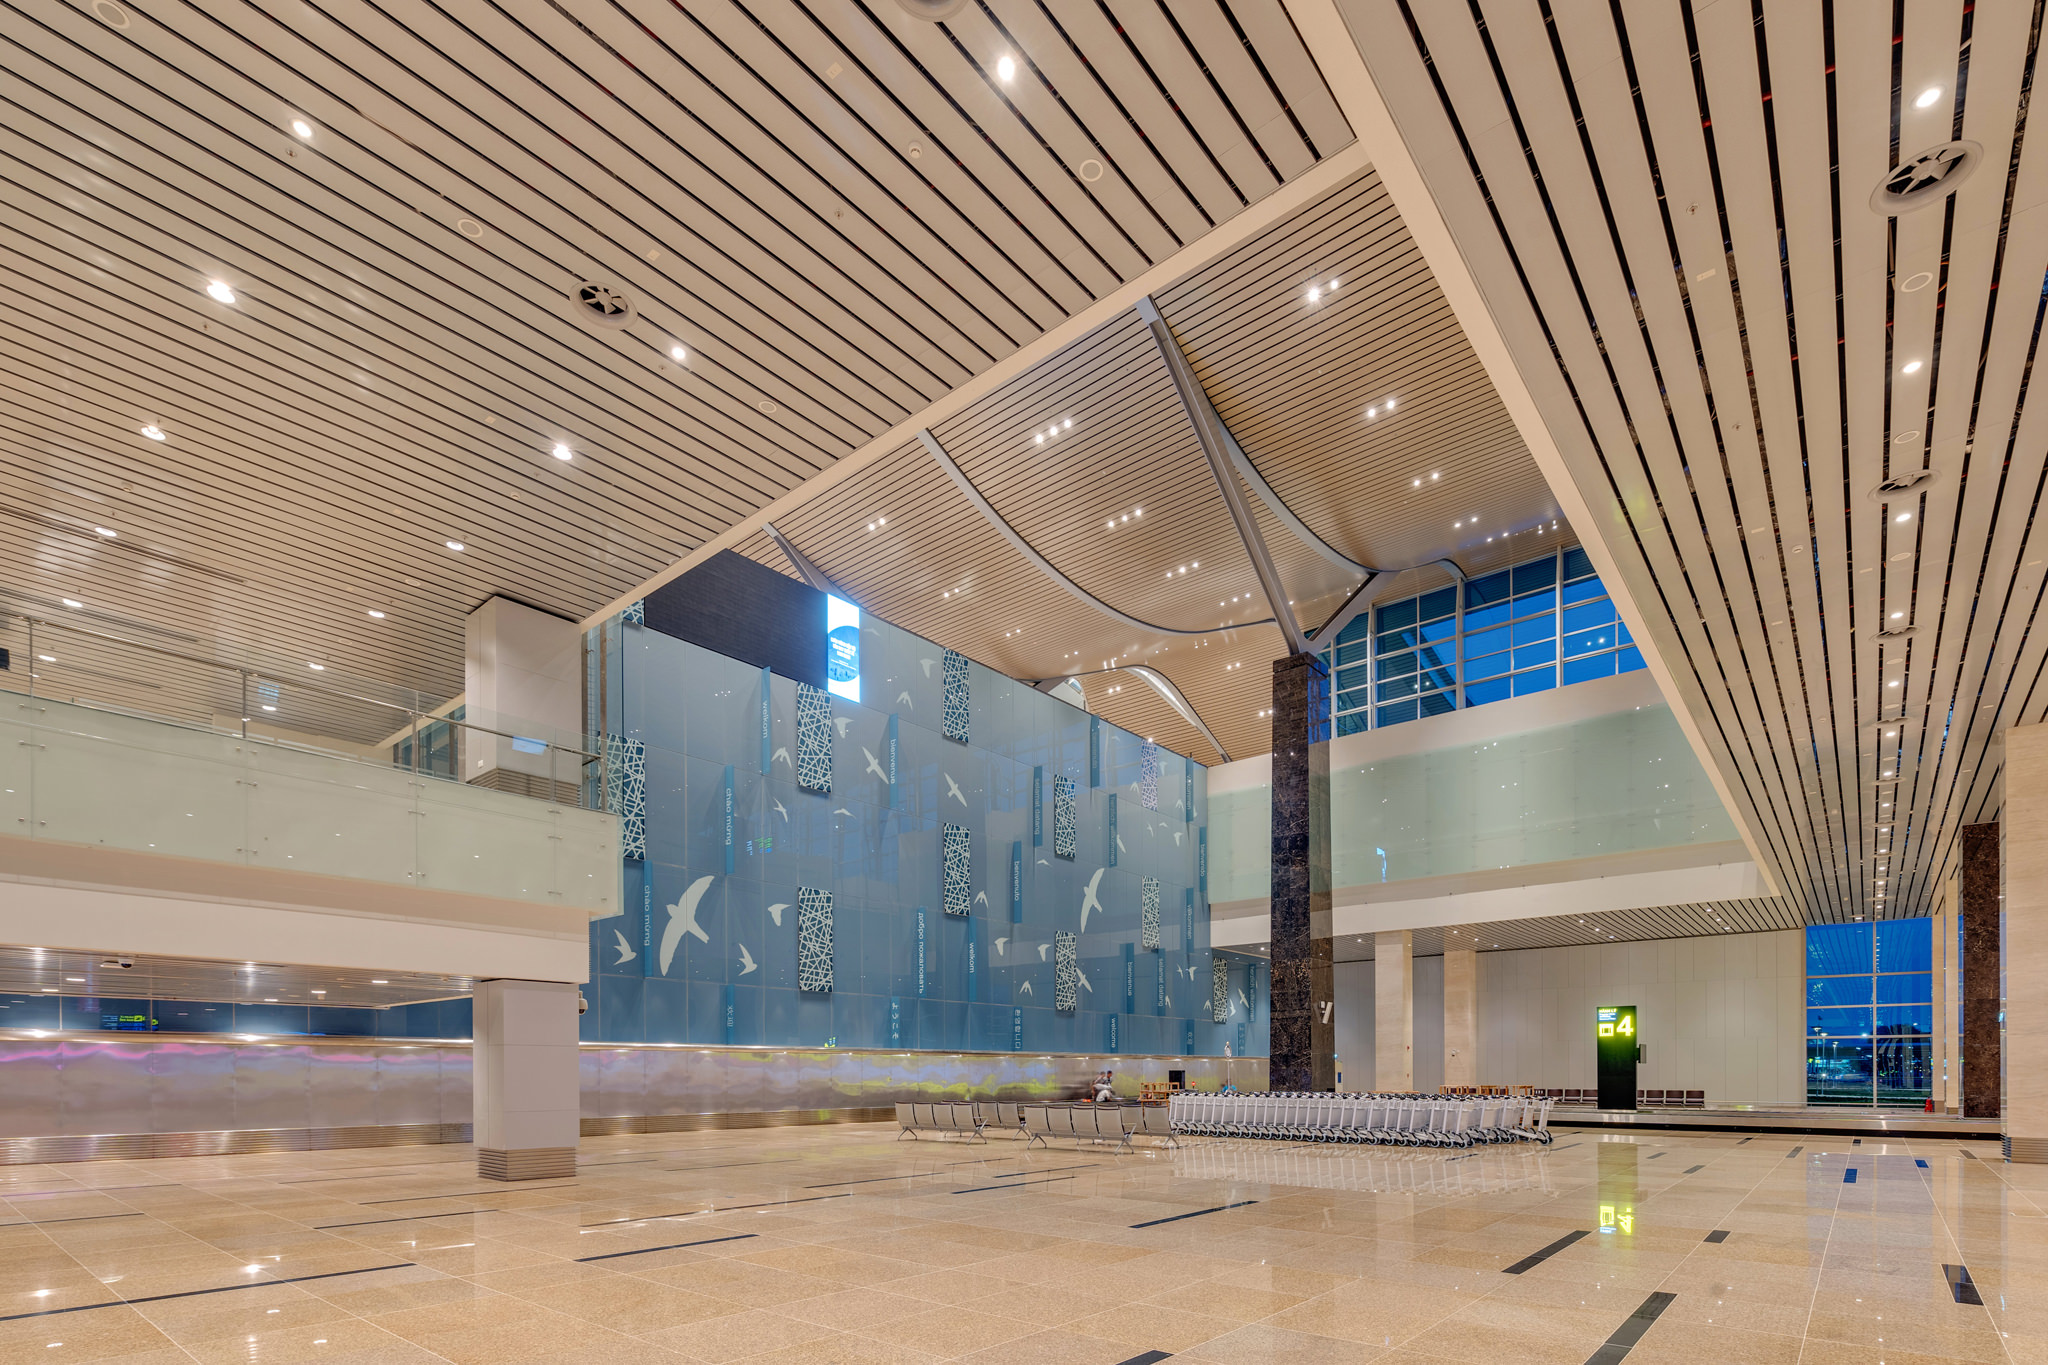 20180626 - Cam Ranh Airport - Architecture - 0411.jpg